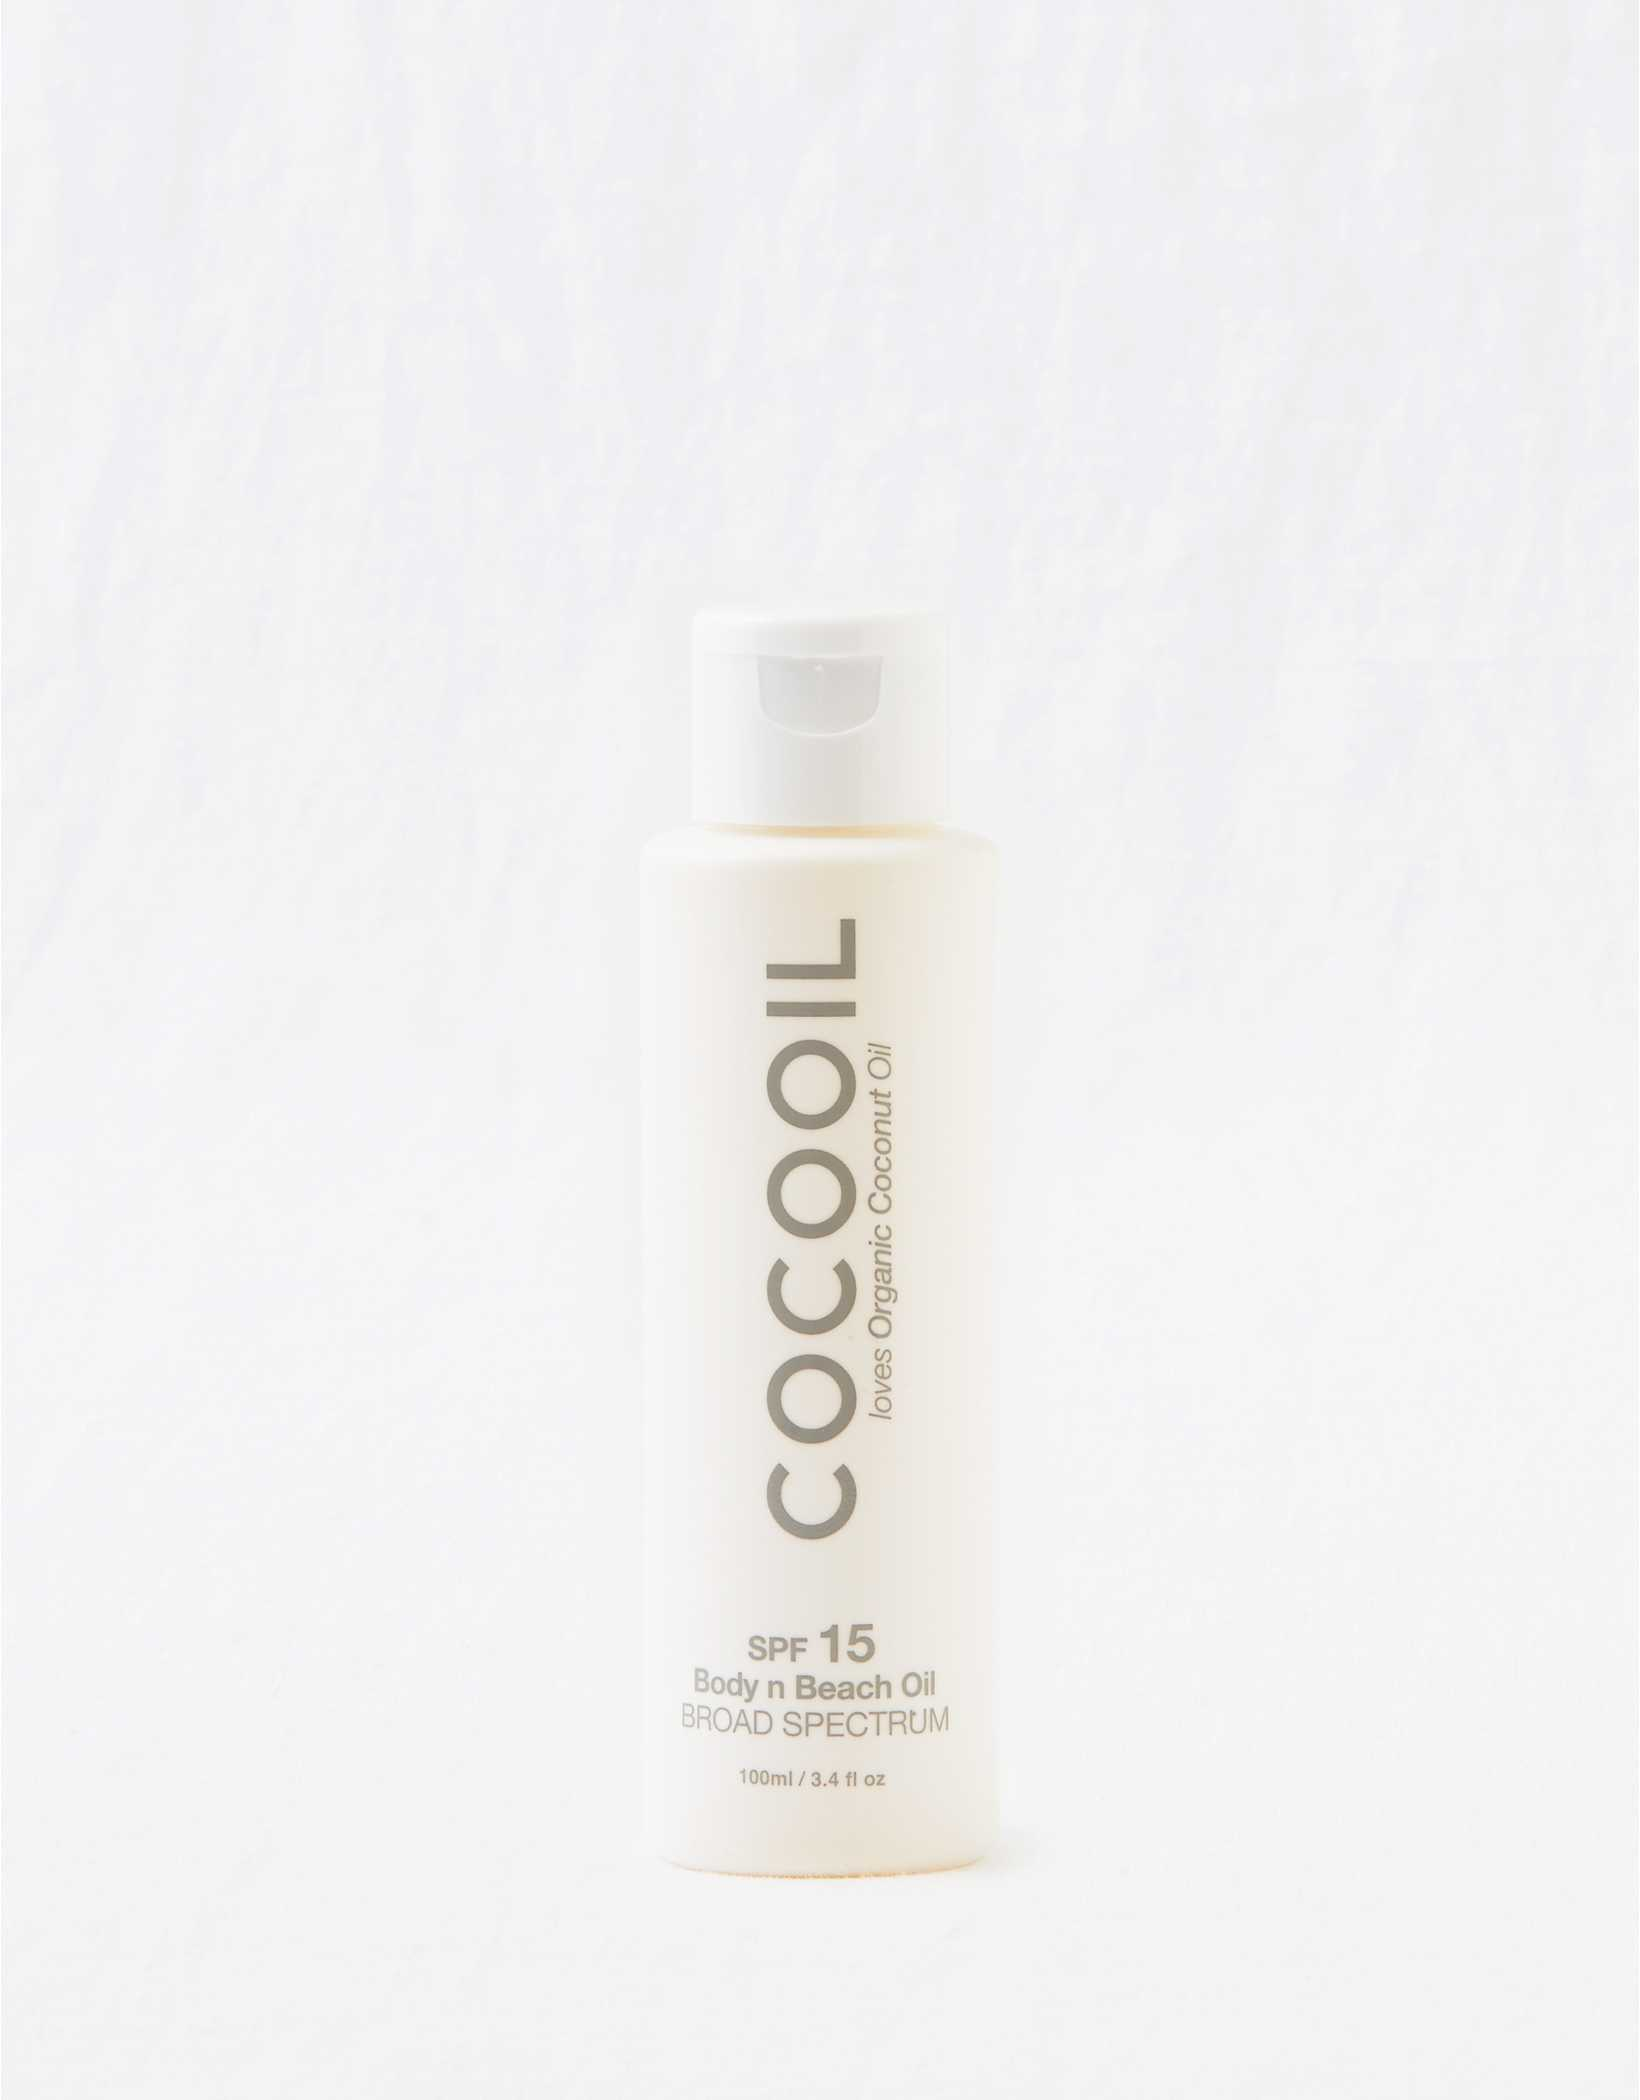 Cocooil Body & Beach Oil SPF 15 3.4 Oz